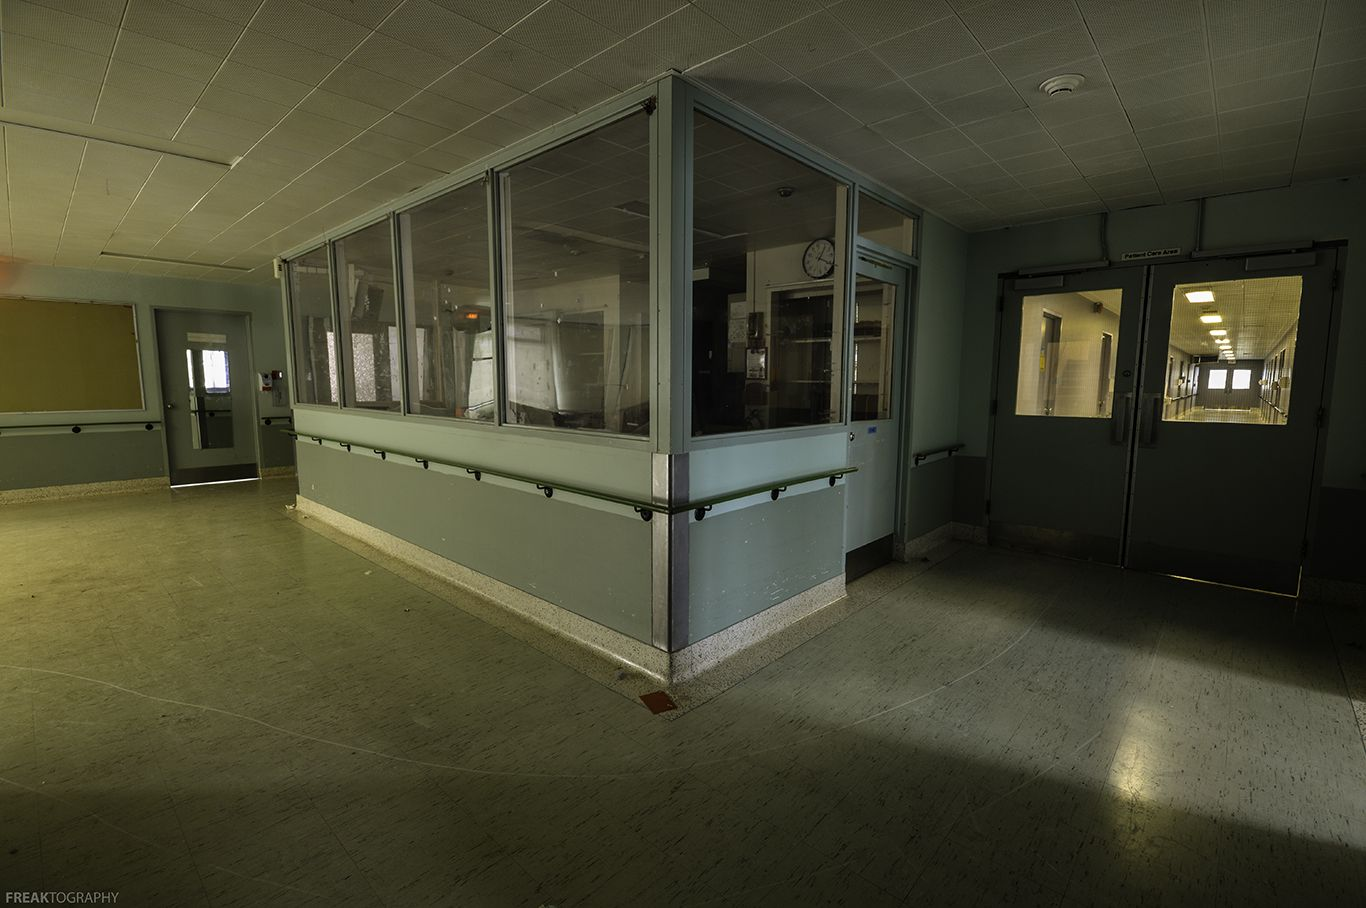 Nurses station and hallways inside the geriatric ward of a